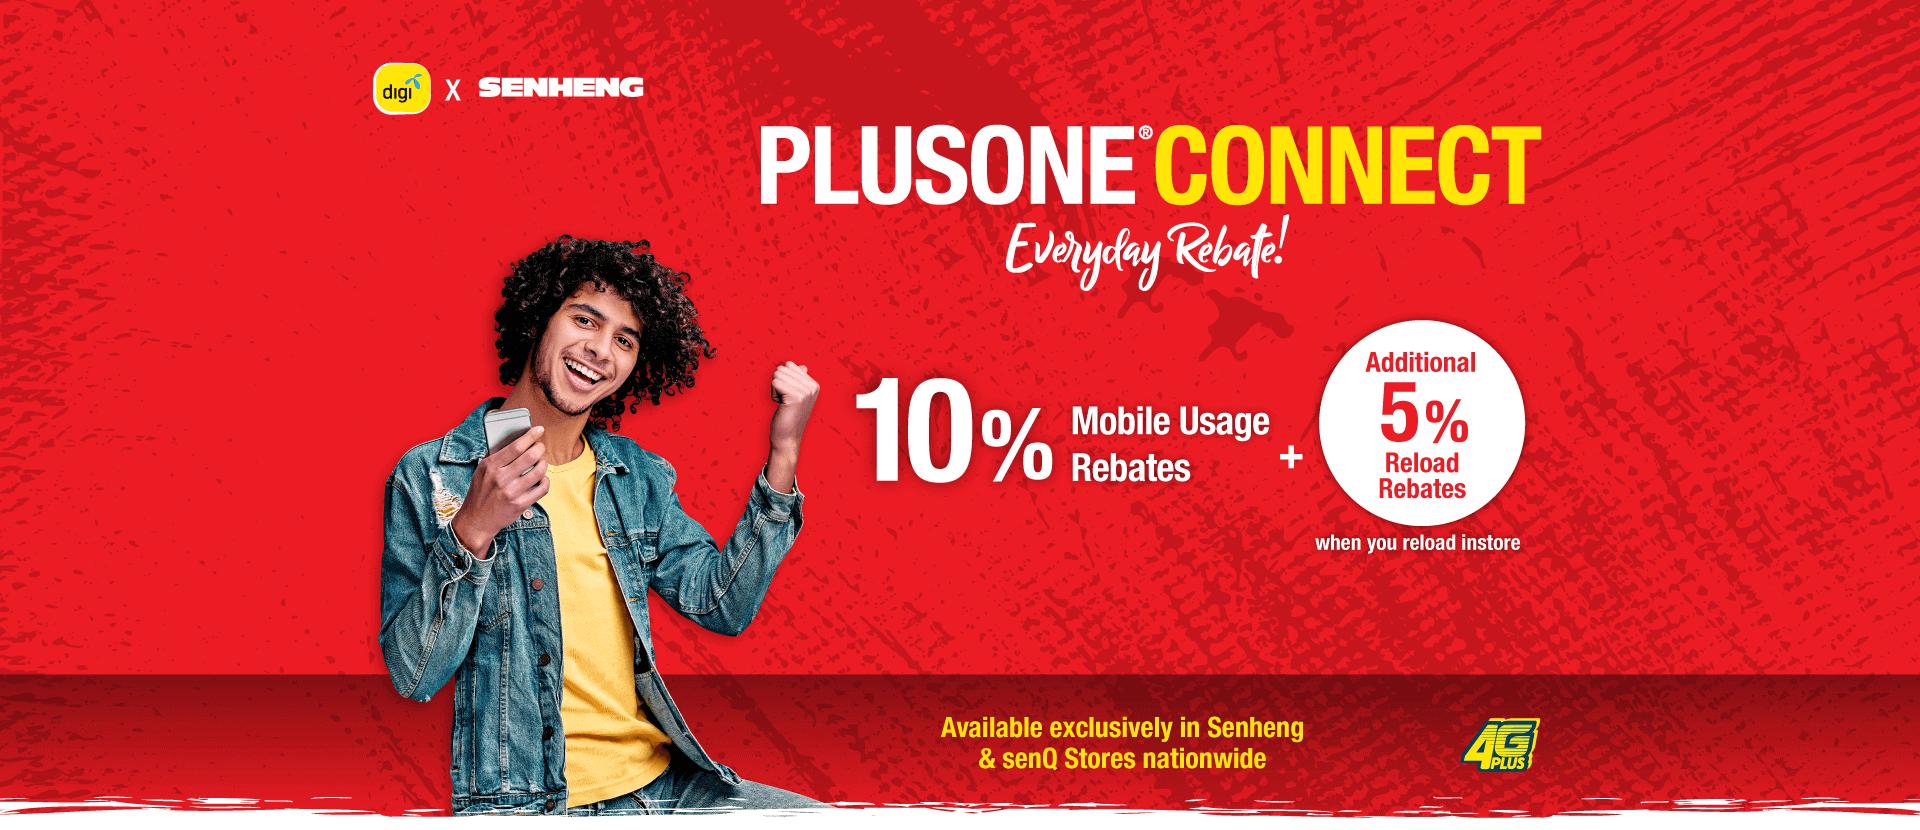 PlusOne Connect Everyday Rebate! 10% Mobile Usage Rebates + Addtional 5% Reload Rebates